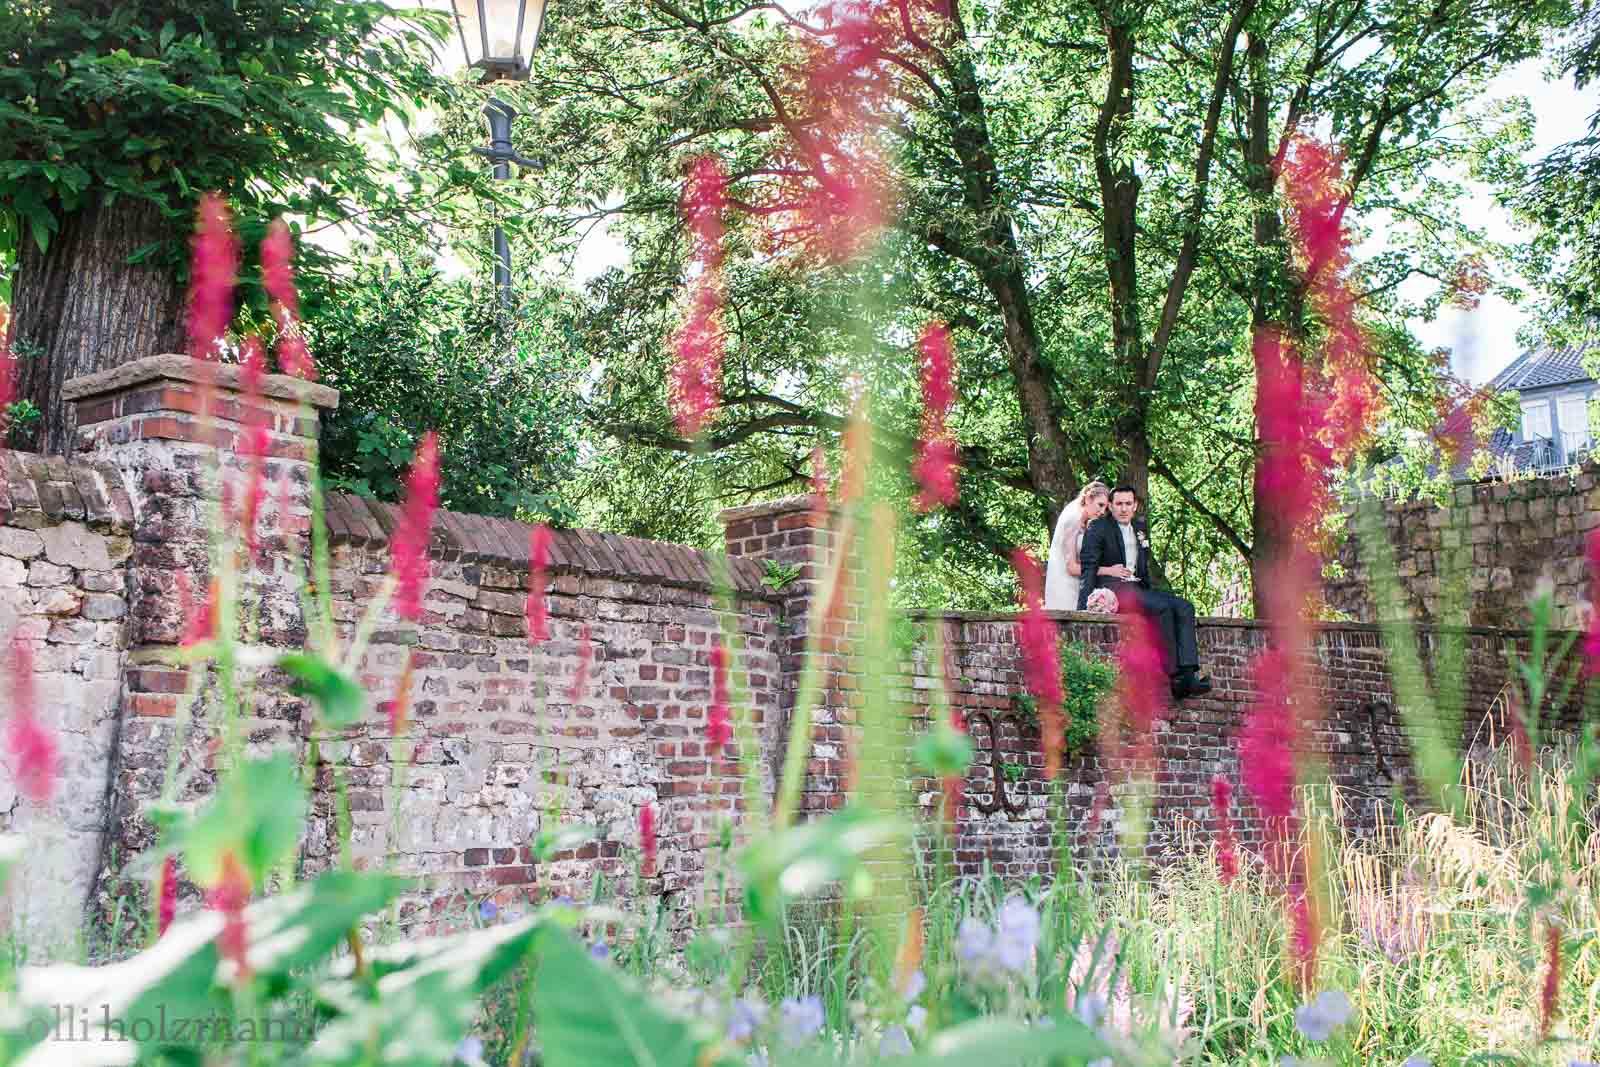 Hochzeitsfotograf nrw-76.jpg